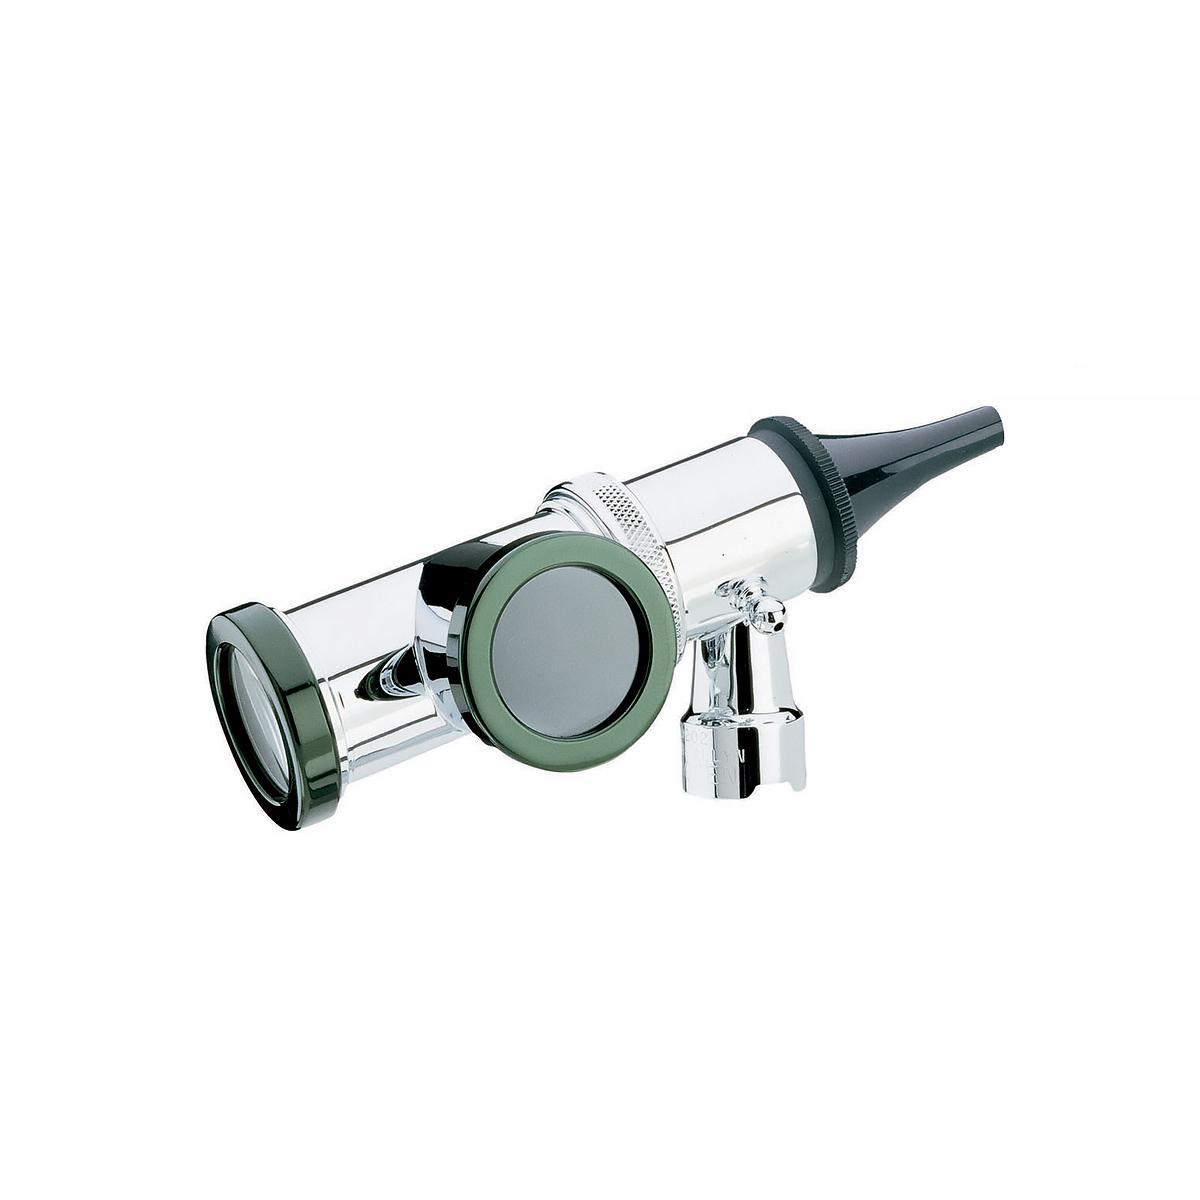 Otoscope pneumatique de consultation de 3,5V, vue de trois quarts